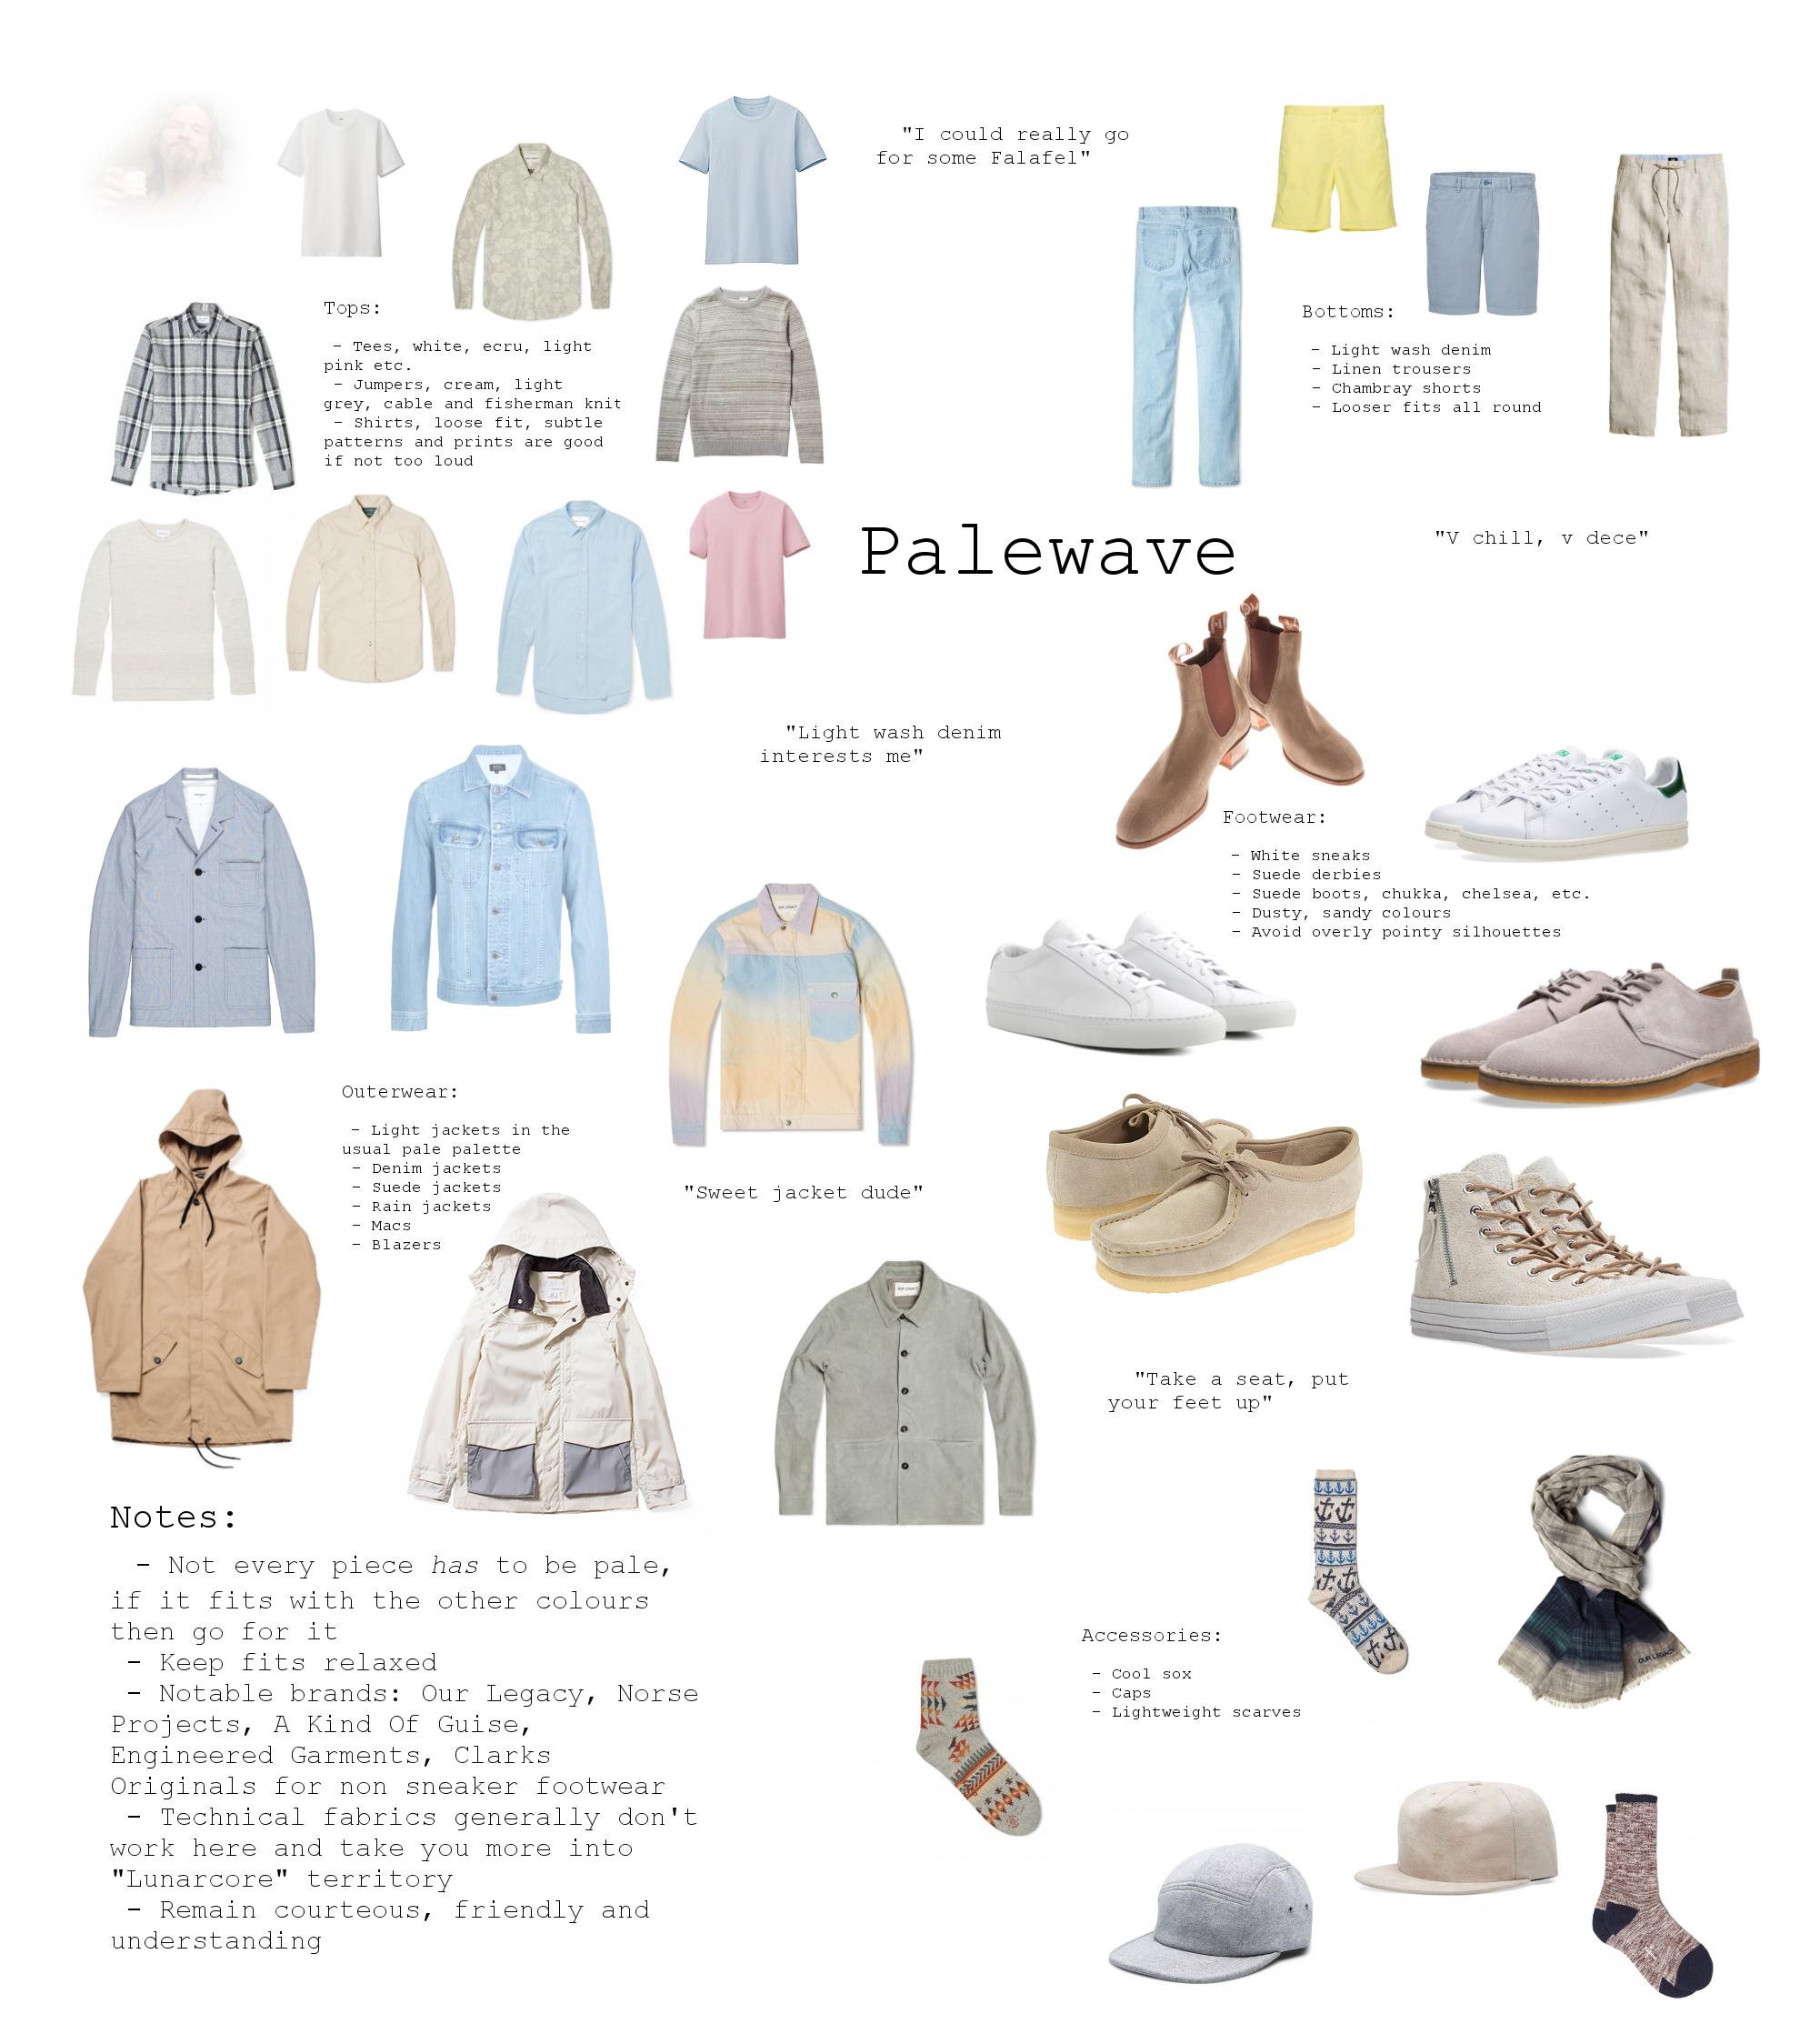 A palewave basics guide by reddit user /u/Joff_Mengum ( source )